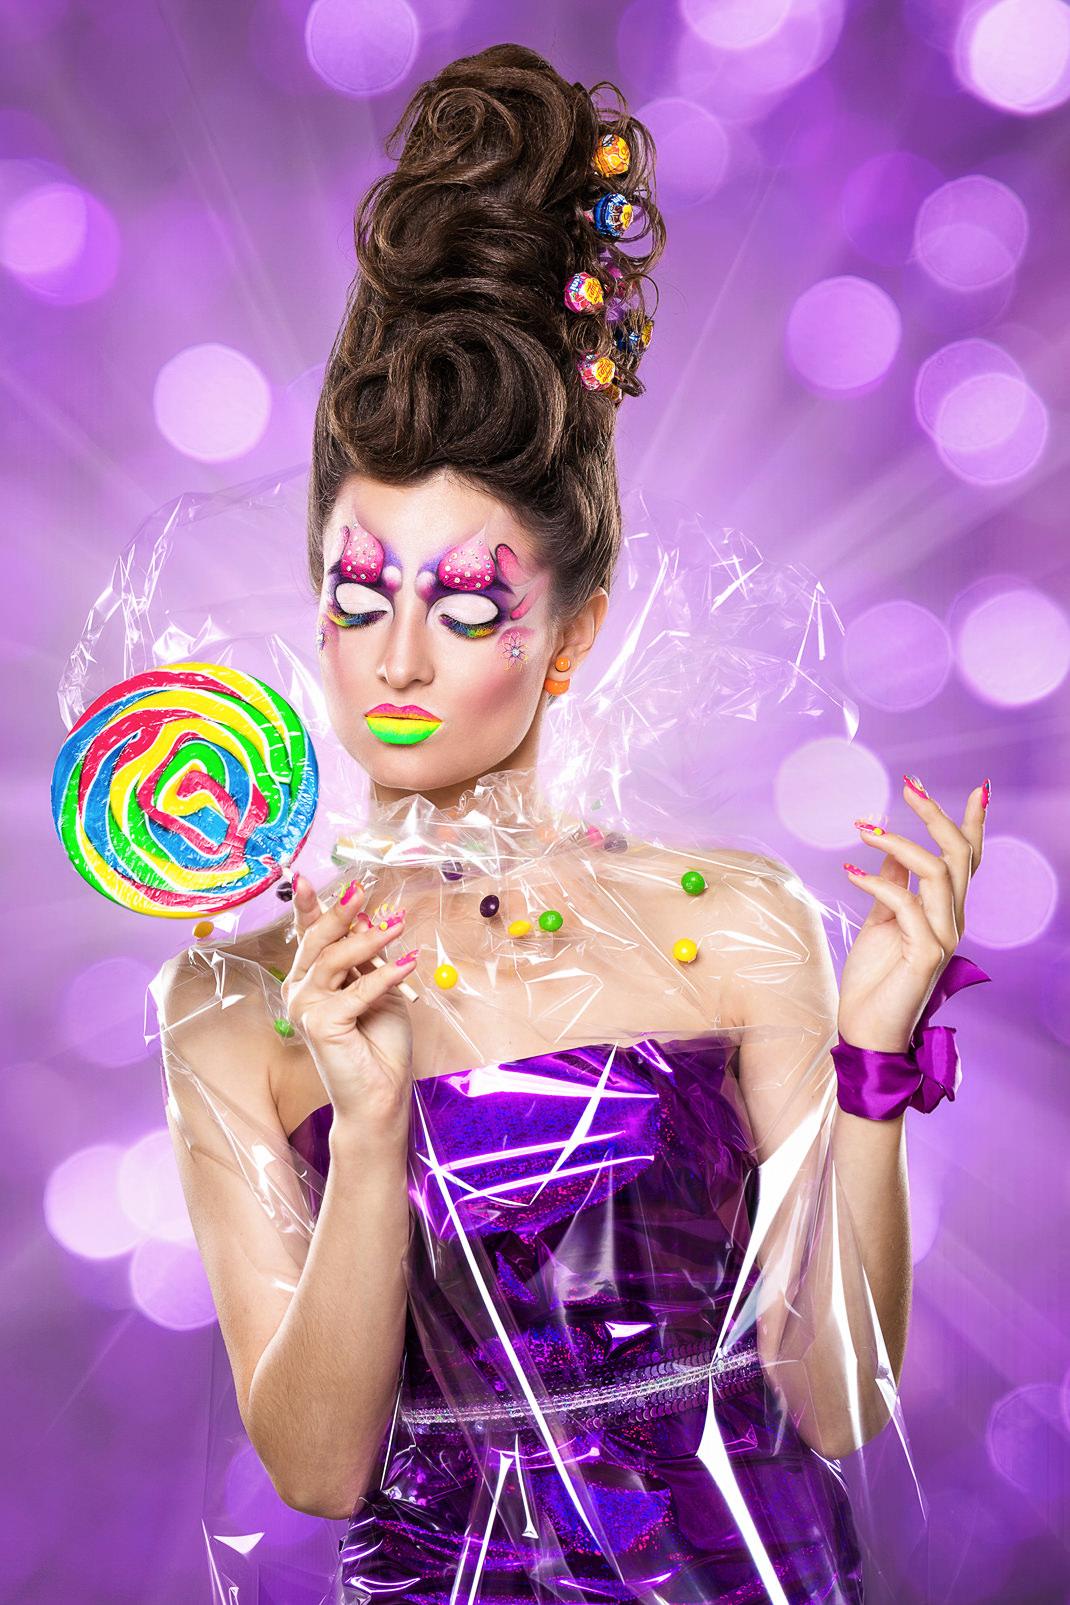 Candygirl - Zoya - Markus Hertzsch